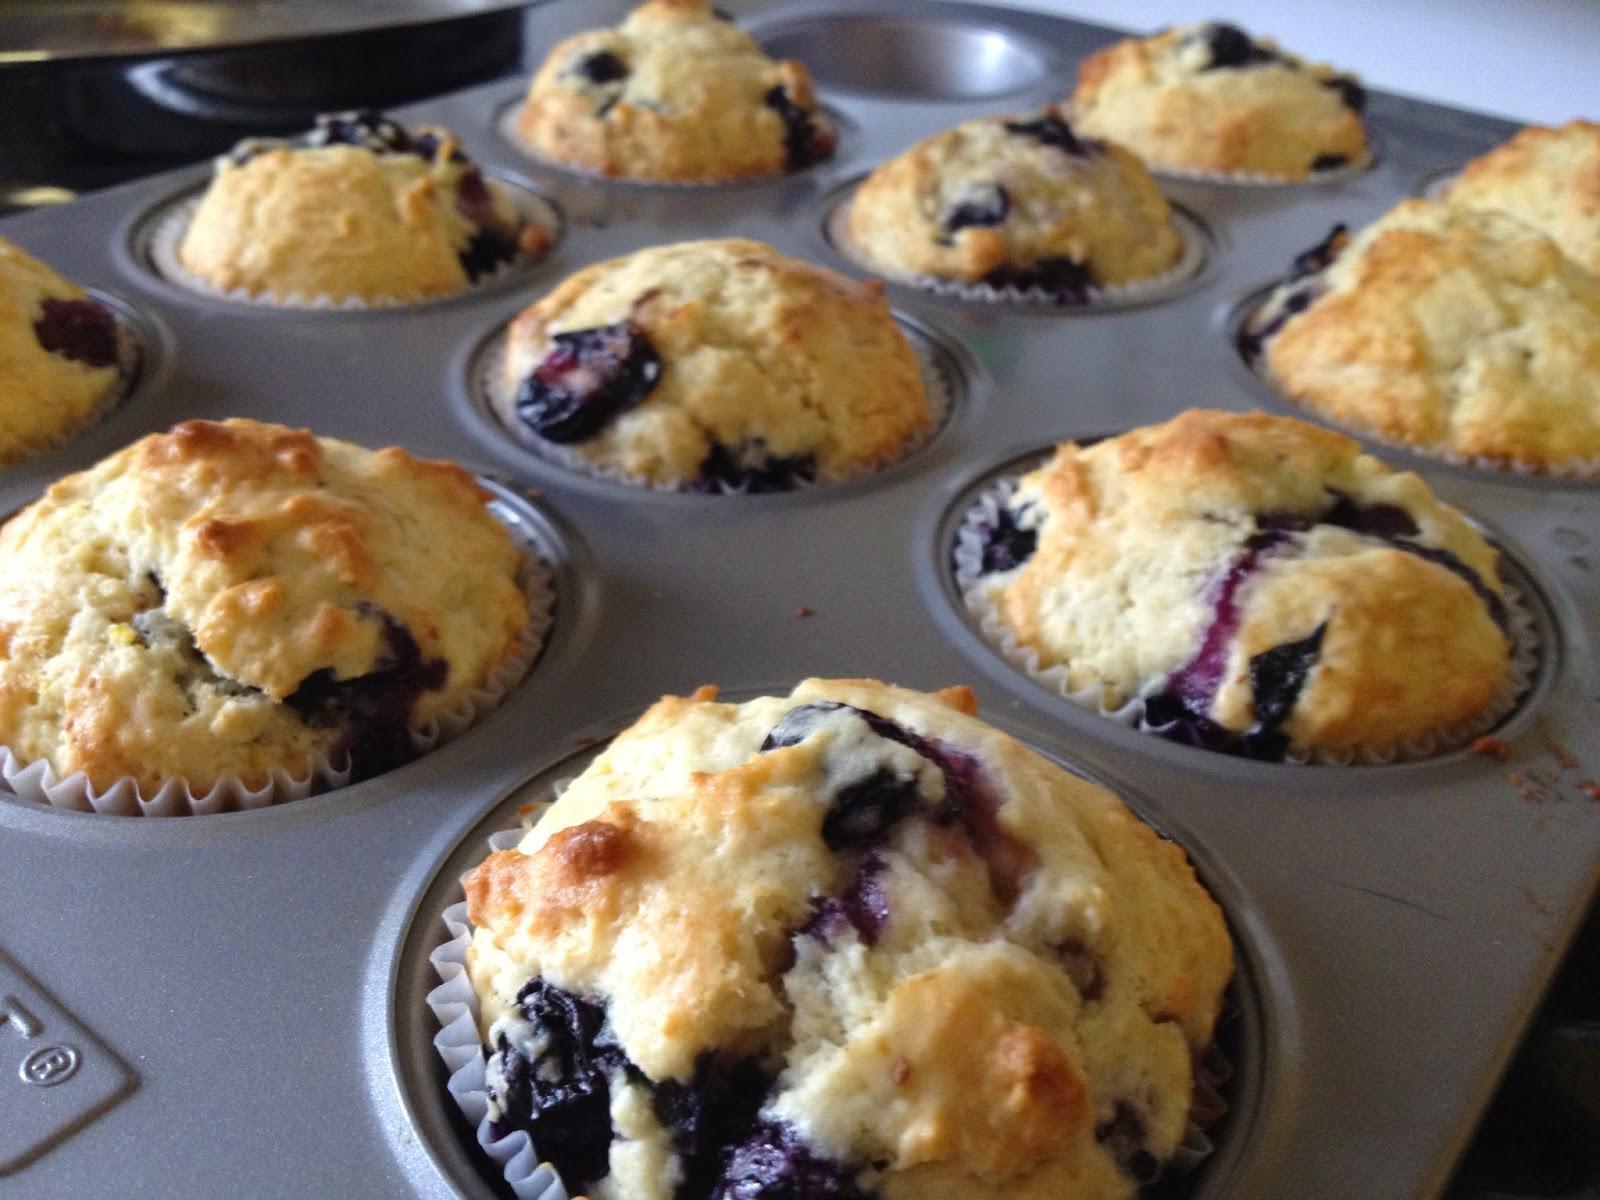 fresh blueberry cupcake resepiu Resepi Kek Aiskrim dan Sedap Enak dan Mudah